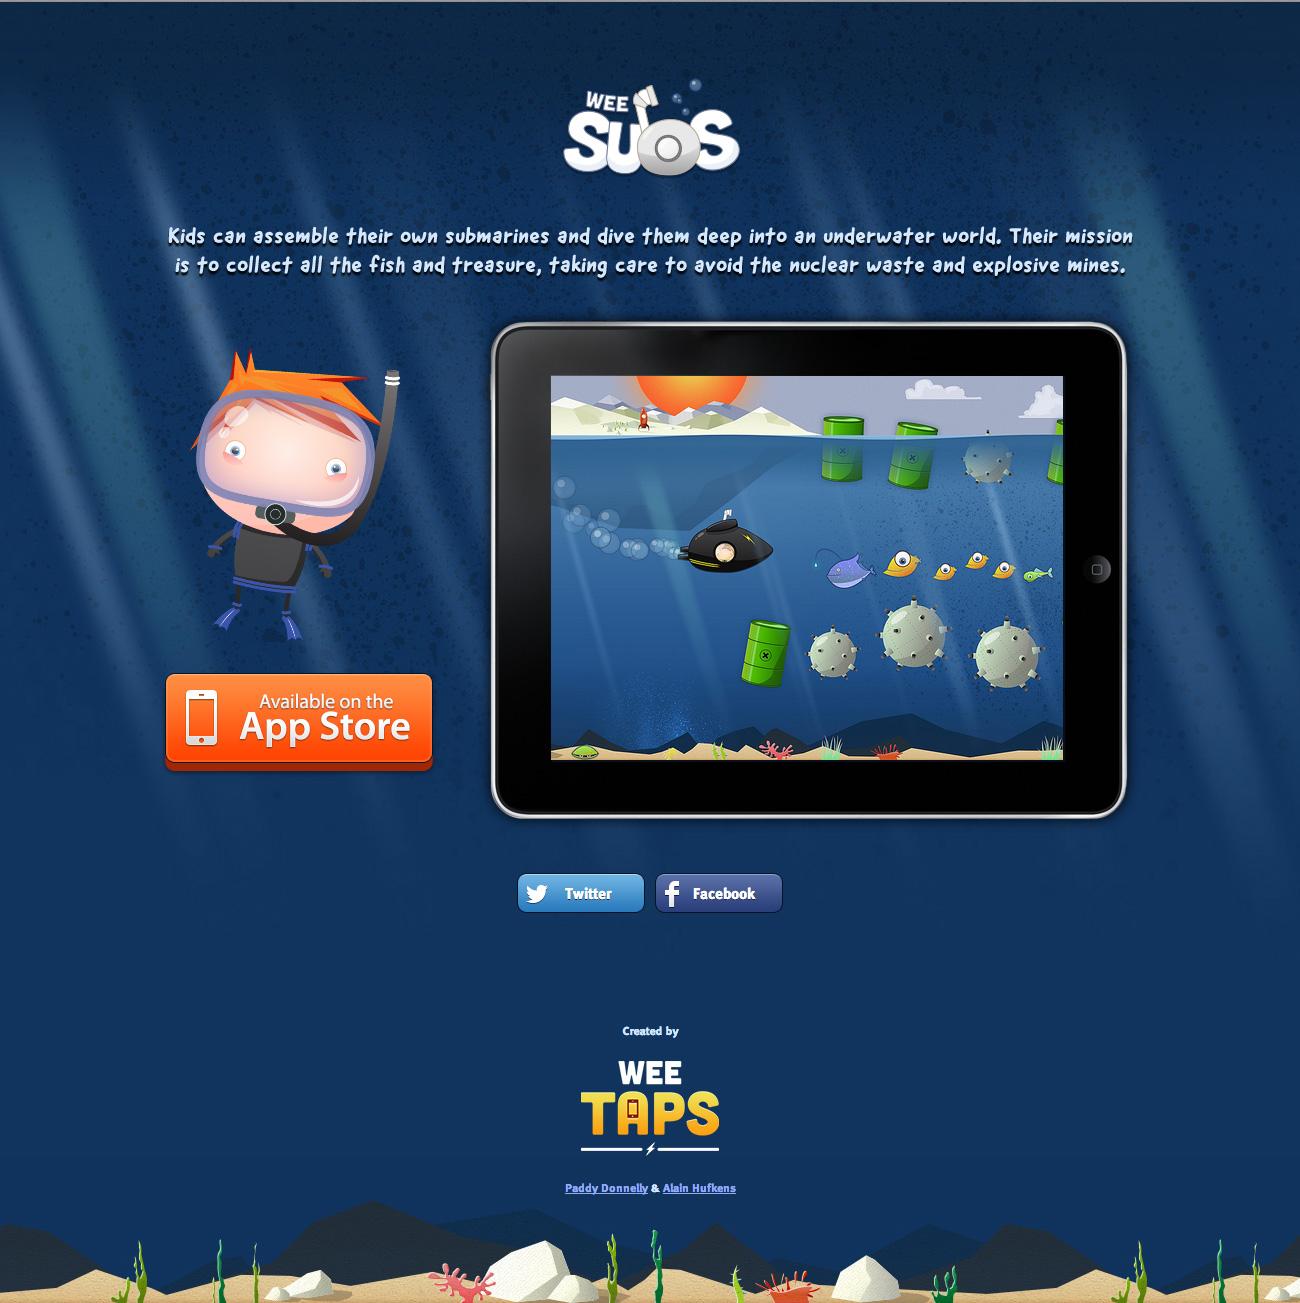 Wee Subs Website Screenshot